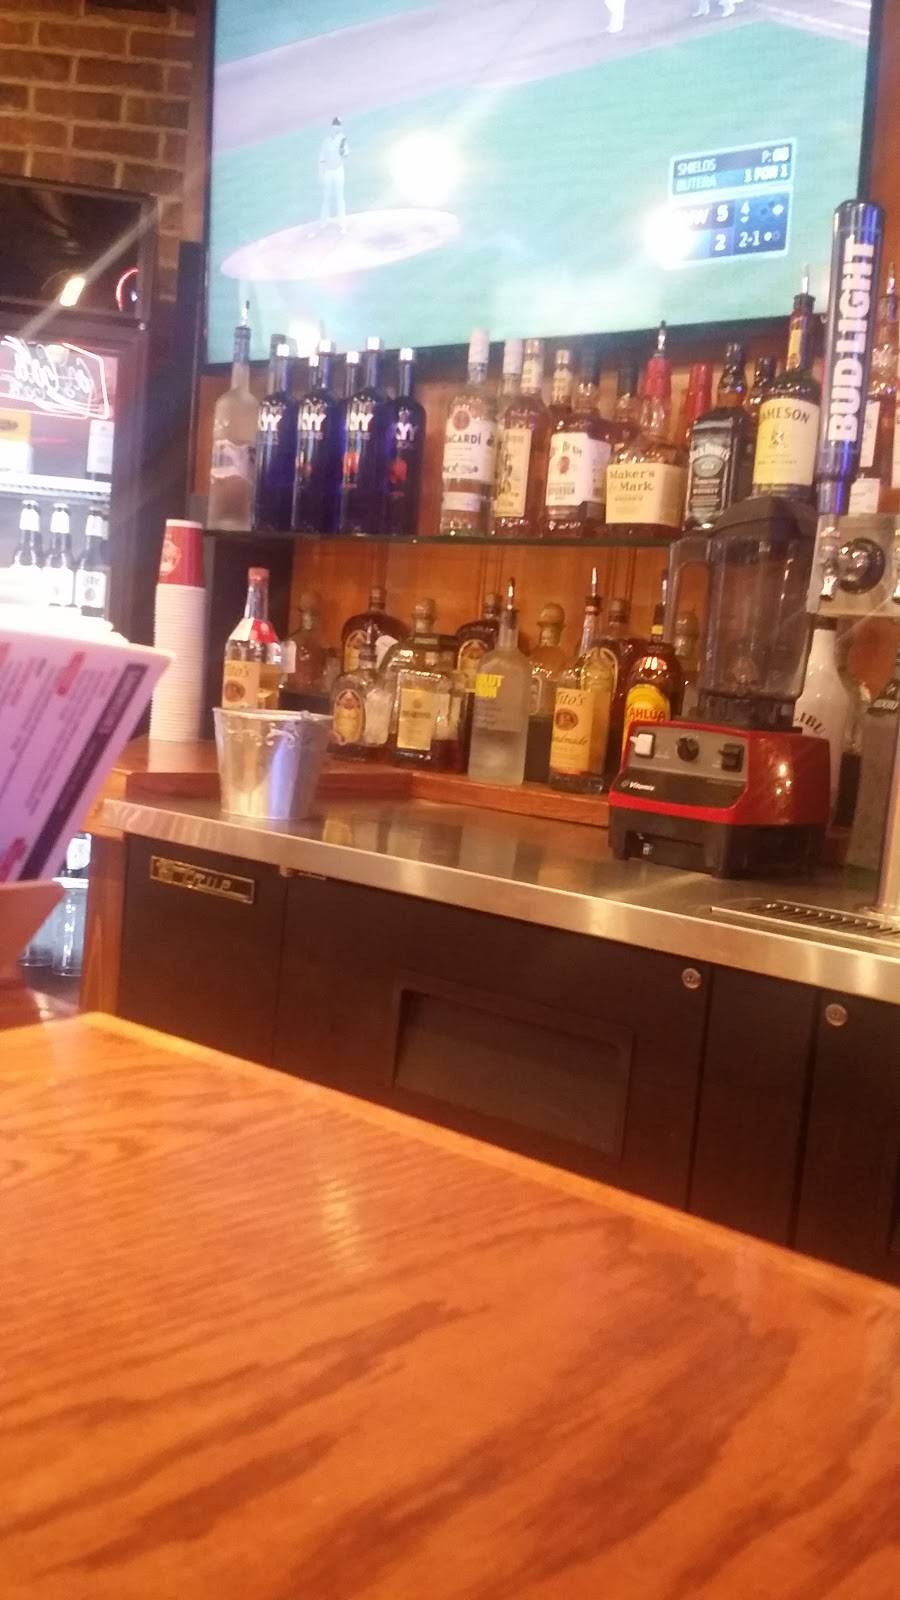 RibCrib BBQ & Grill - restaurant  | Photo 10 of 10 | Address: 8040 S Yale Ave, Tulsa, OK 74136, USA | Phone: (918) 492-8627